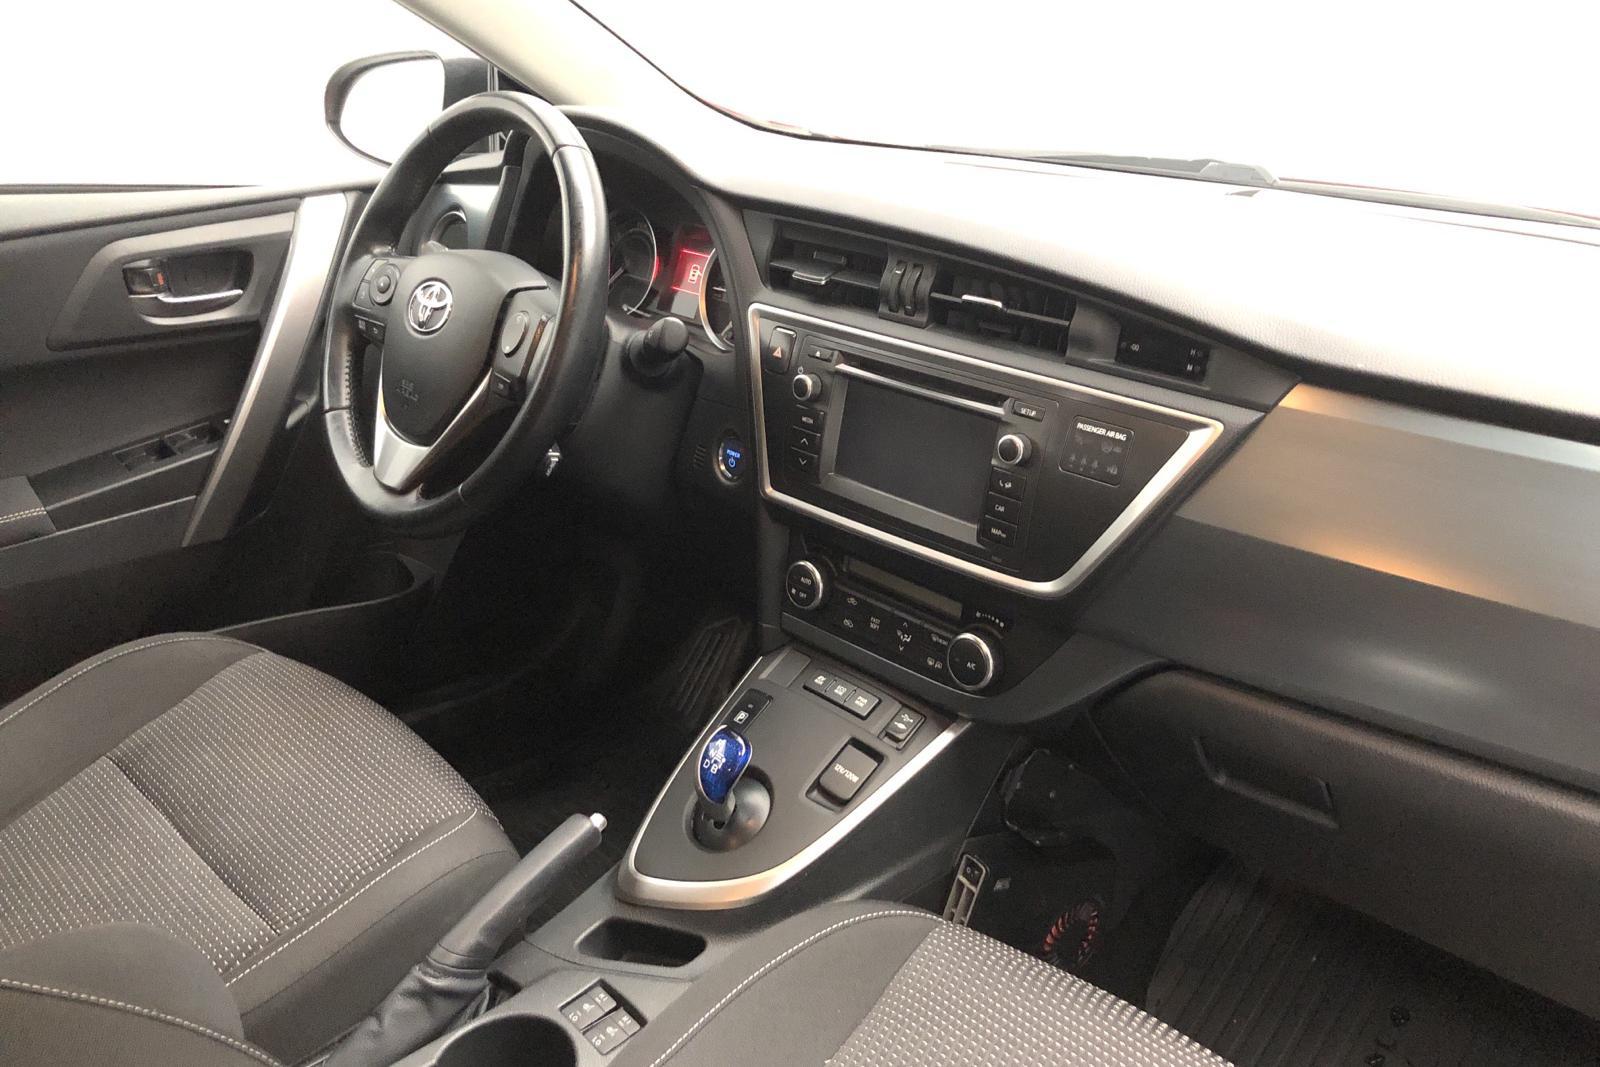 Toyota Auris 1.8 HSD 5dr (99hk) - 0 mil - Automat - Dark Red - 2014